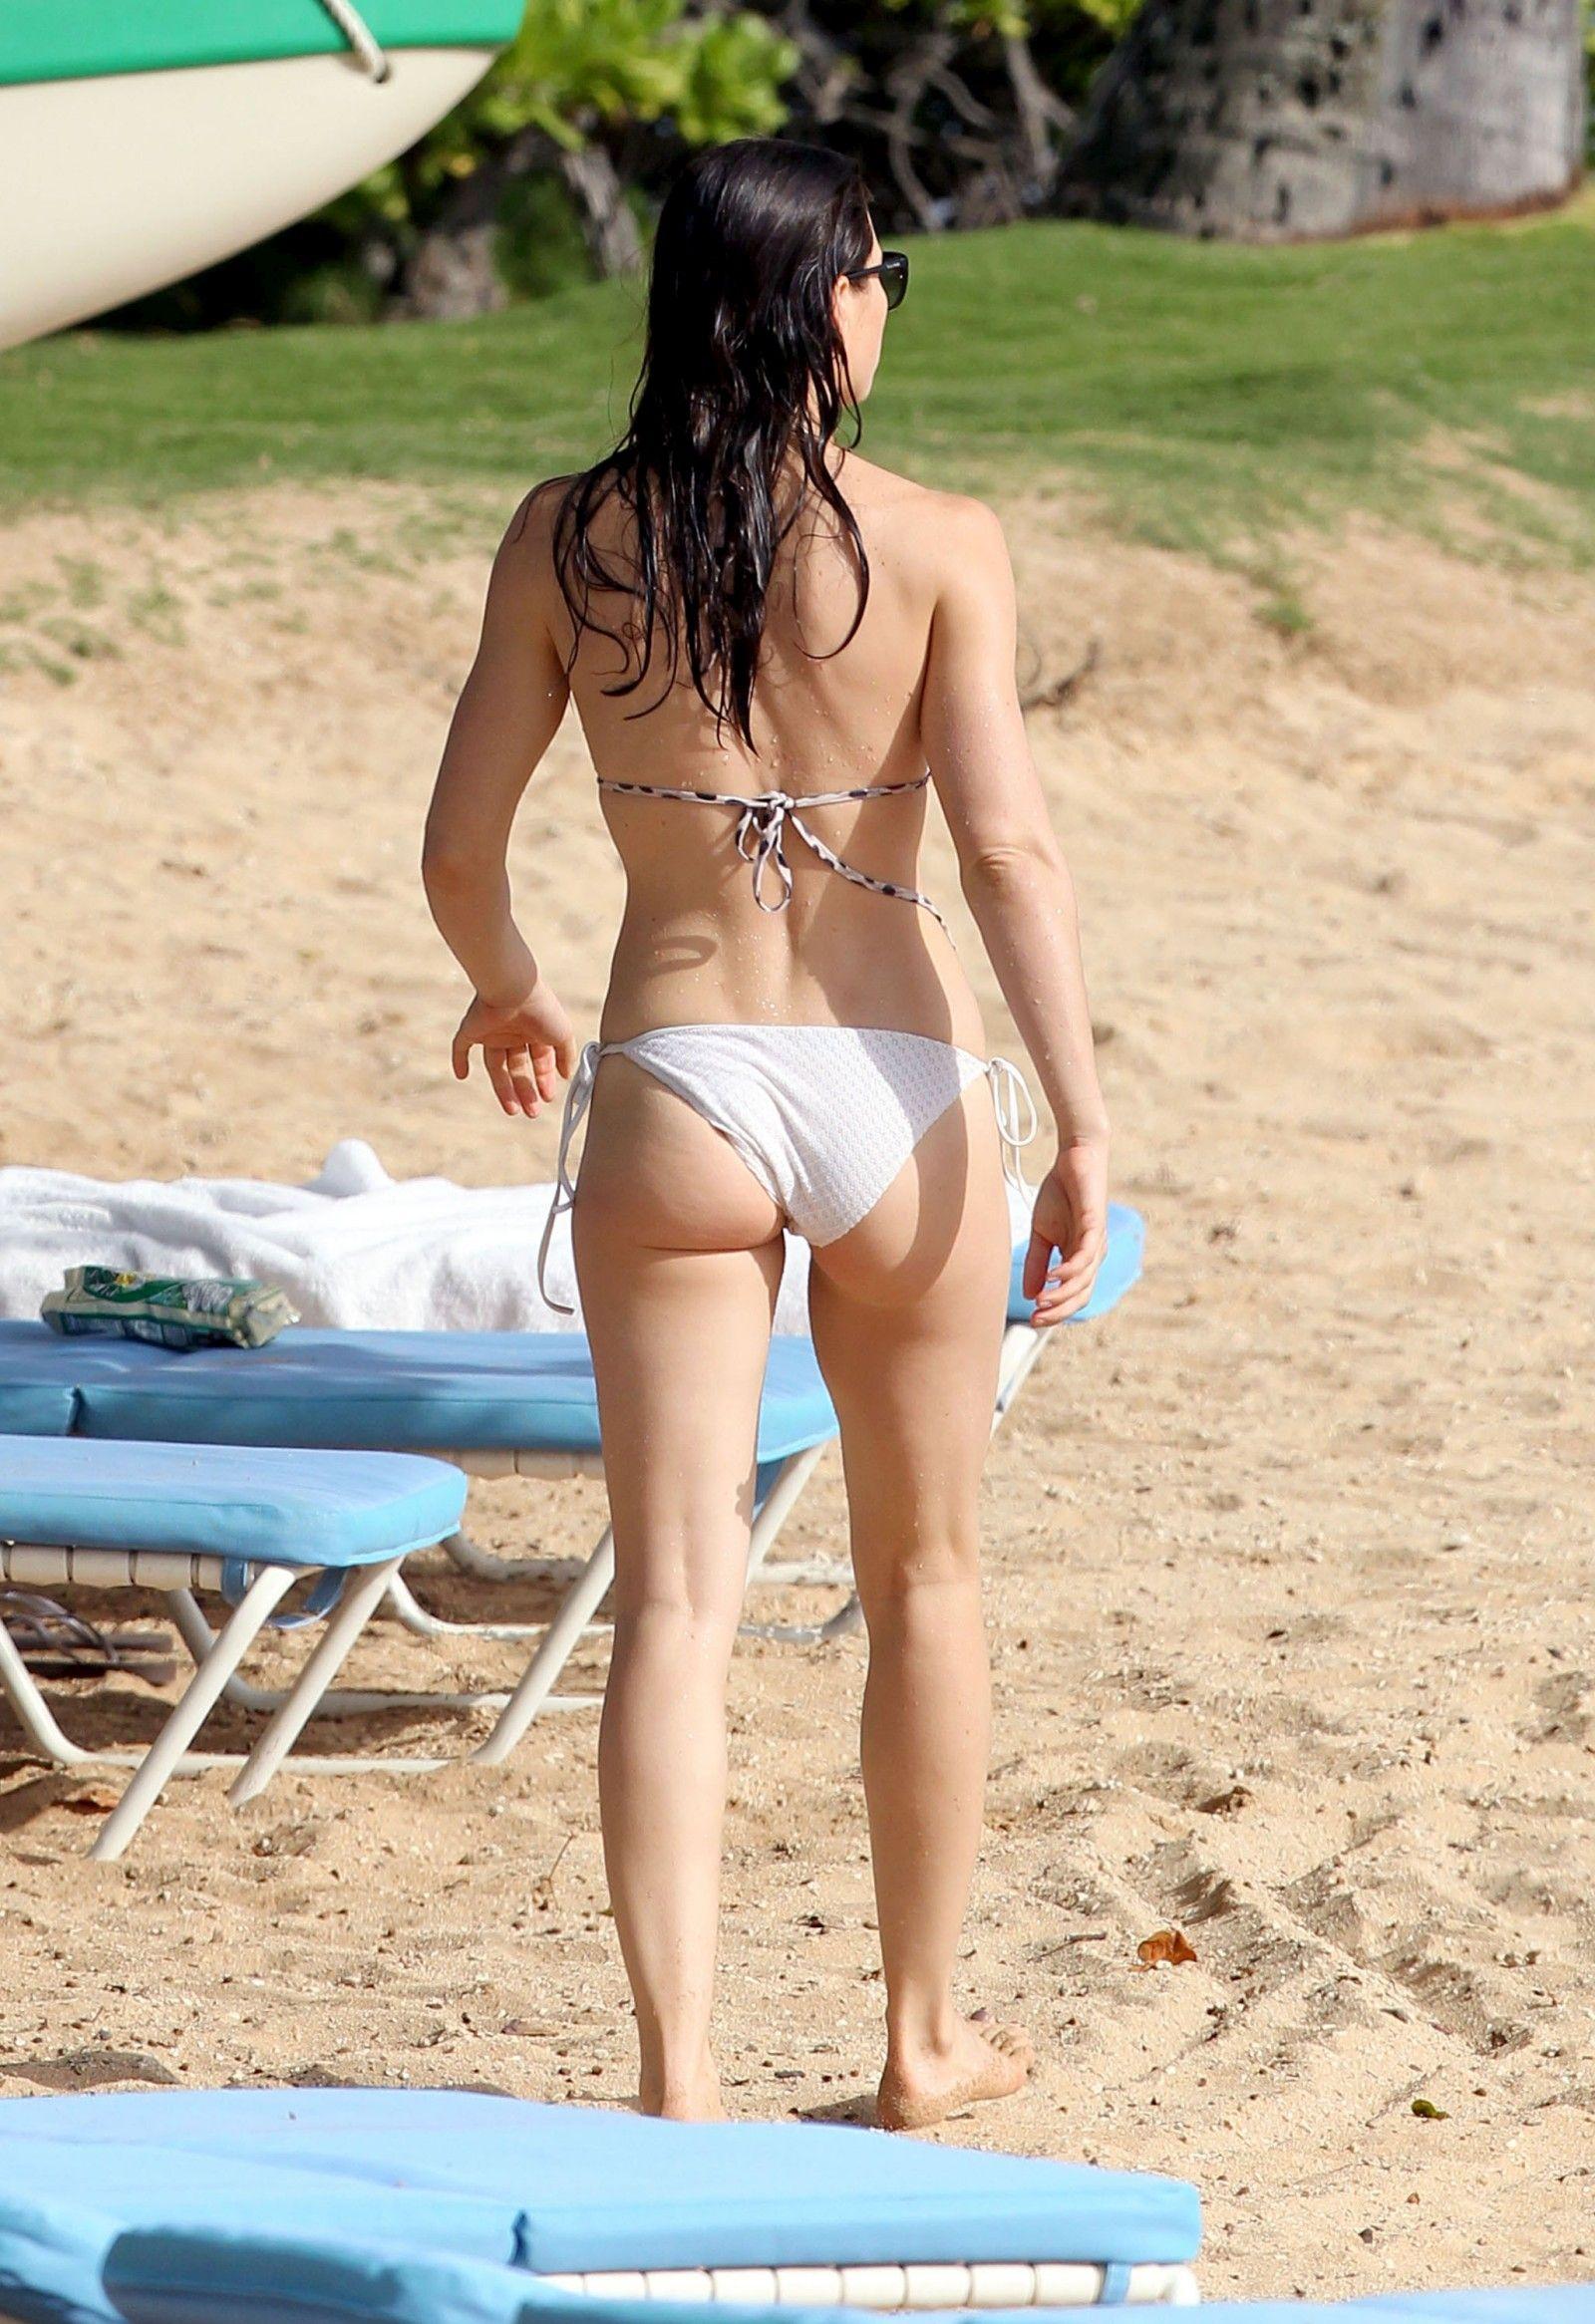 Jessica biel bikini body